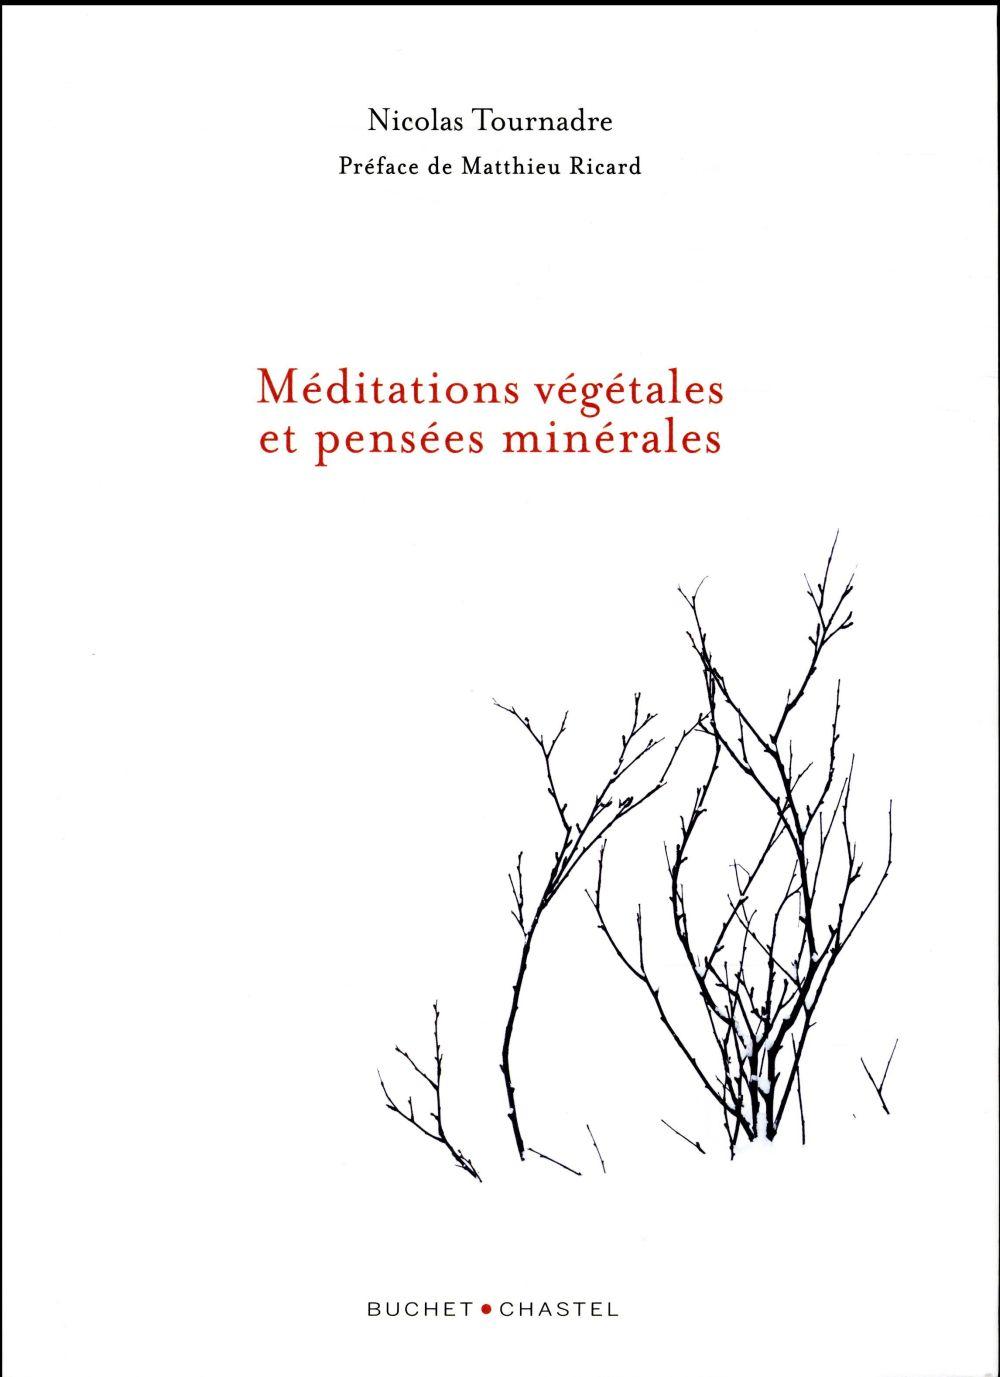 MEDITATIONS VEGETALES ET PENSEES MINERALES